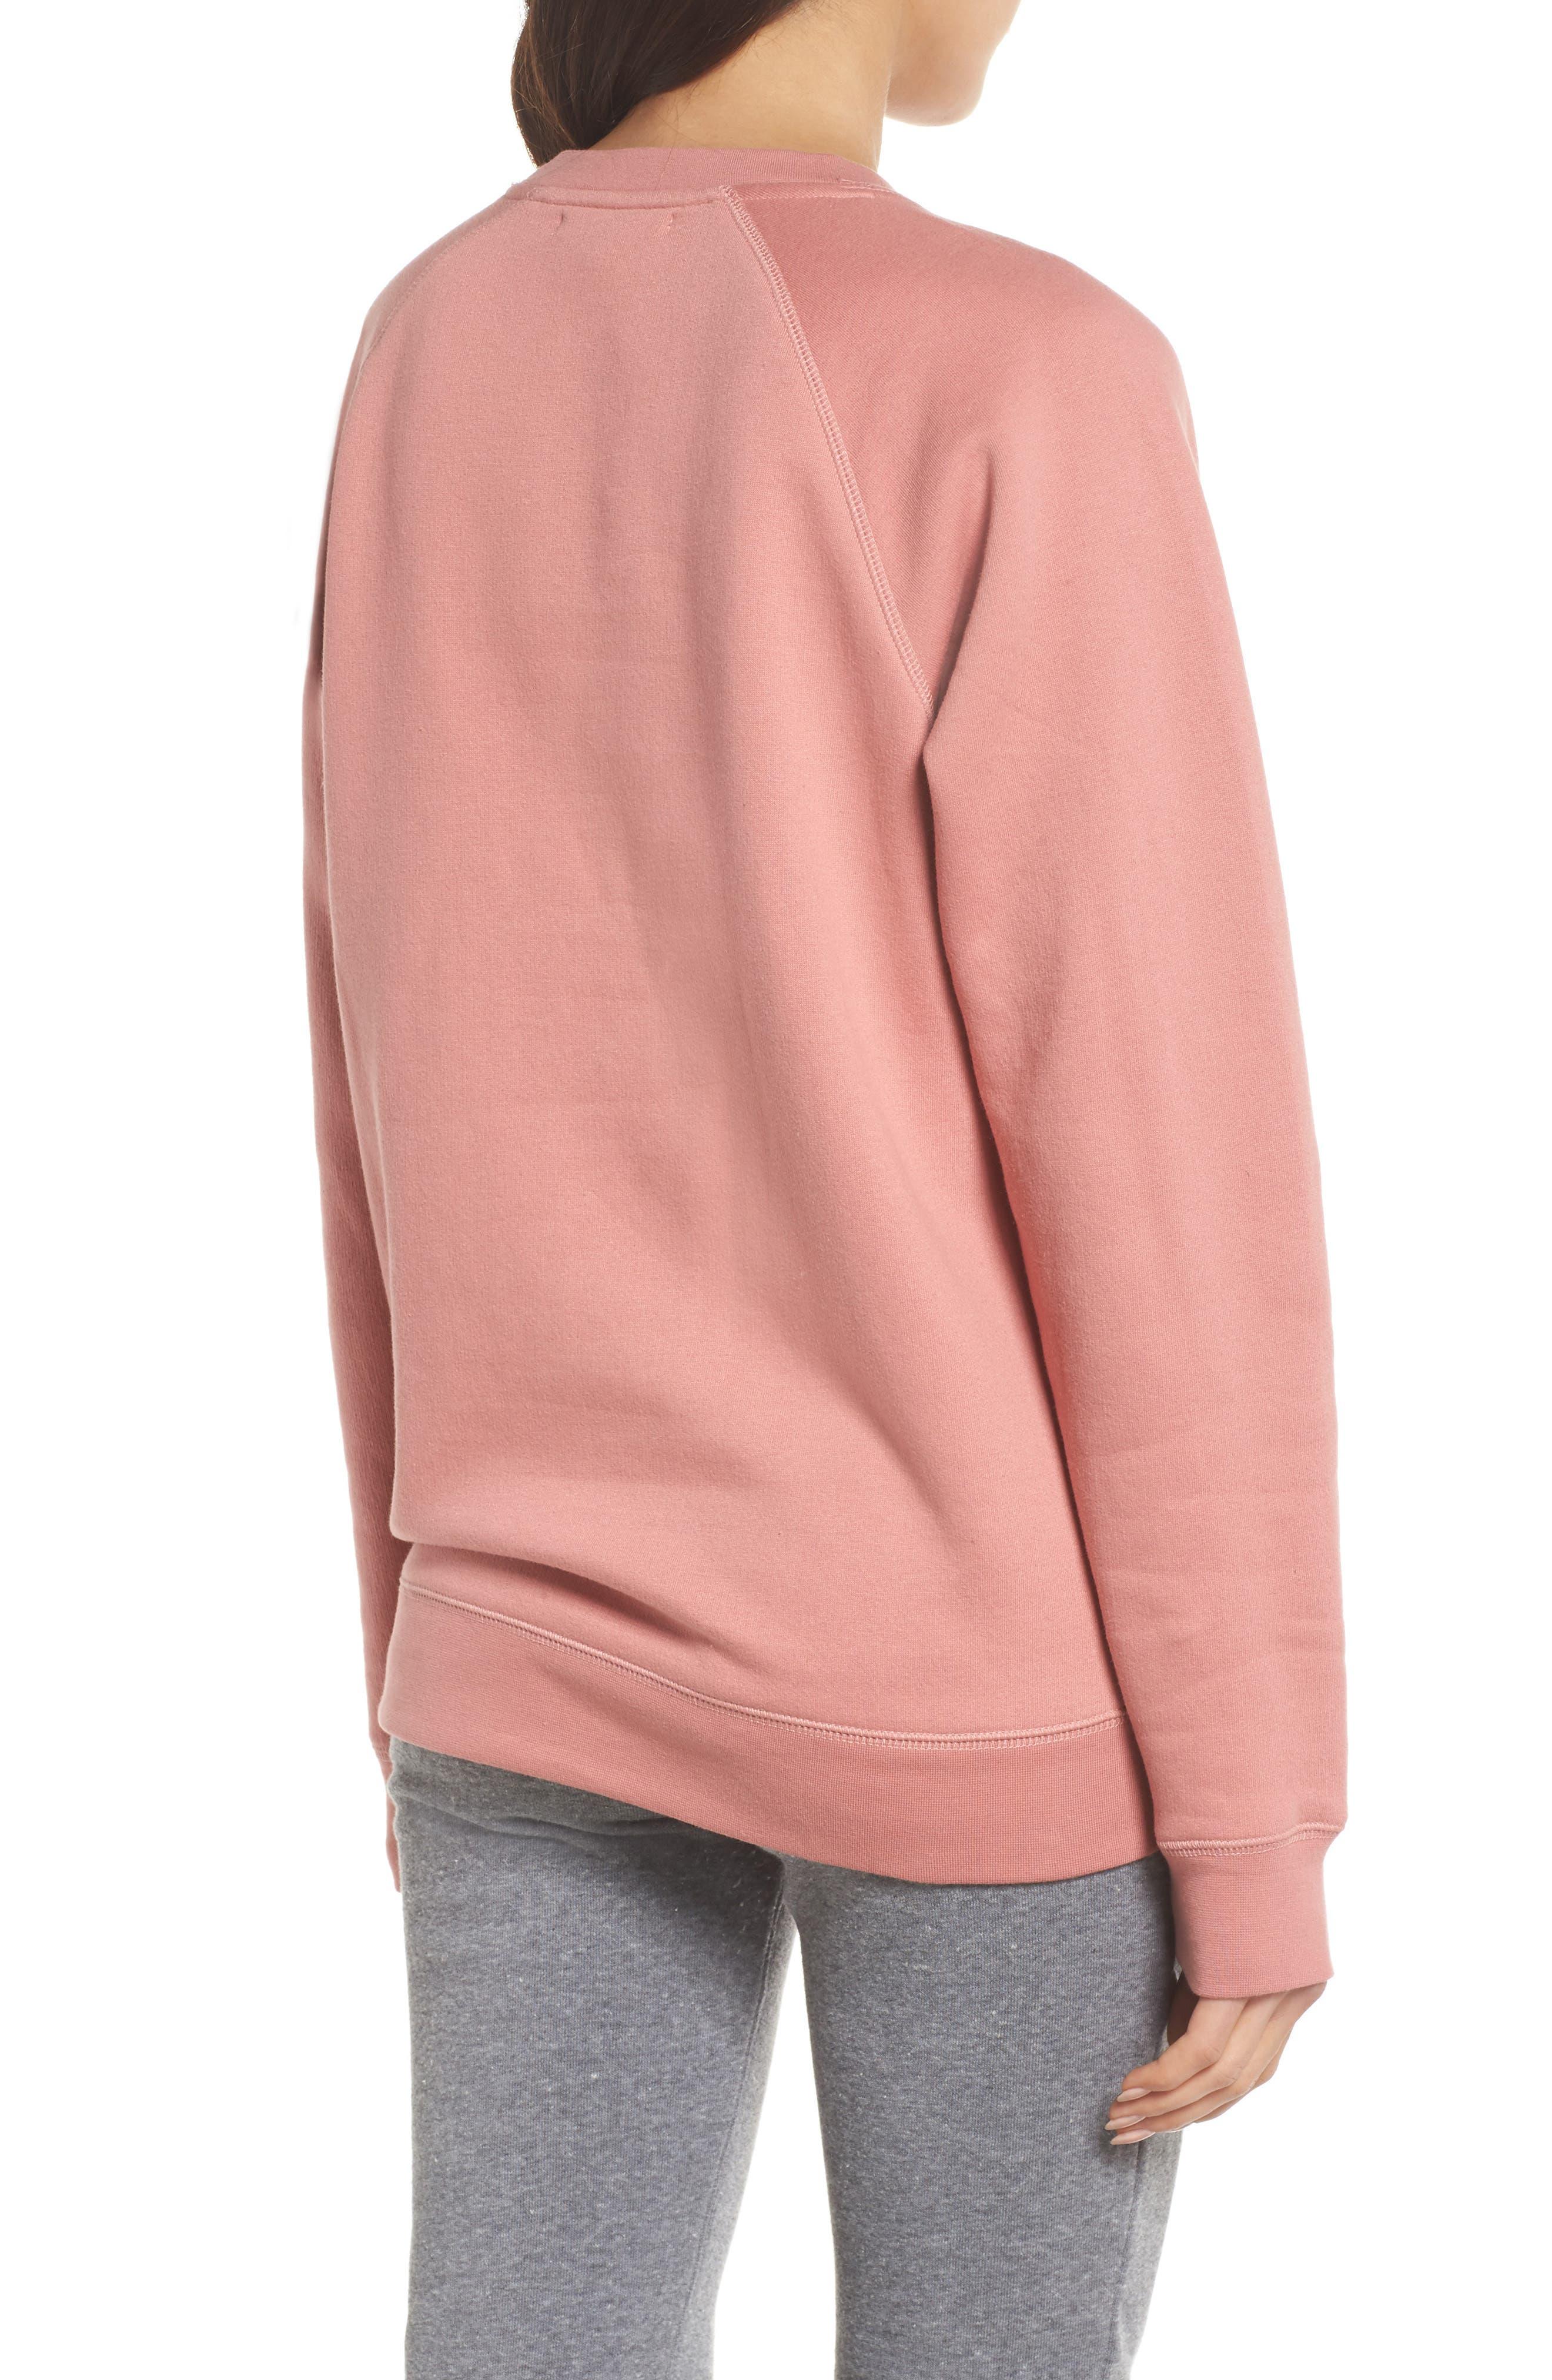 Brunette Crewneck Sweatshirt,                             Alternate thumbnail 2, color,                             Dusty Rose